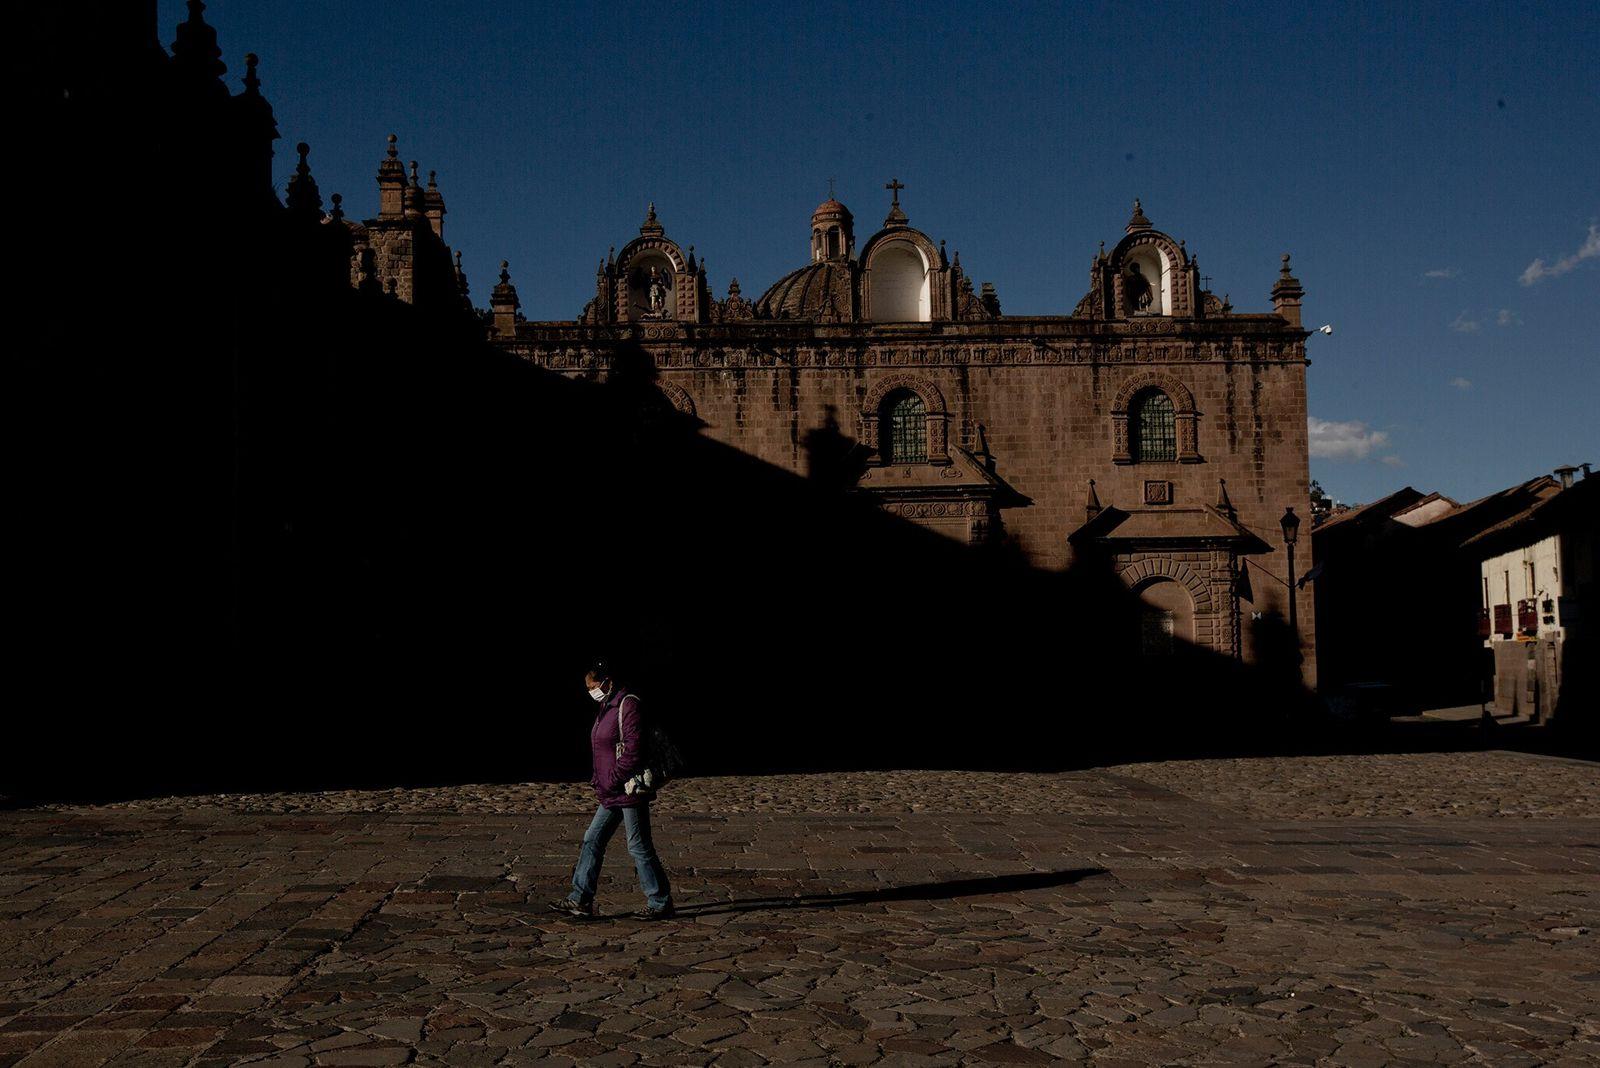 Colapso do turismo durante pandemia causa problemas para Machu Picchu